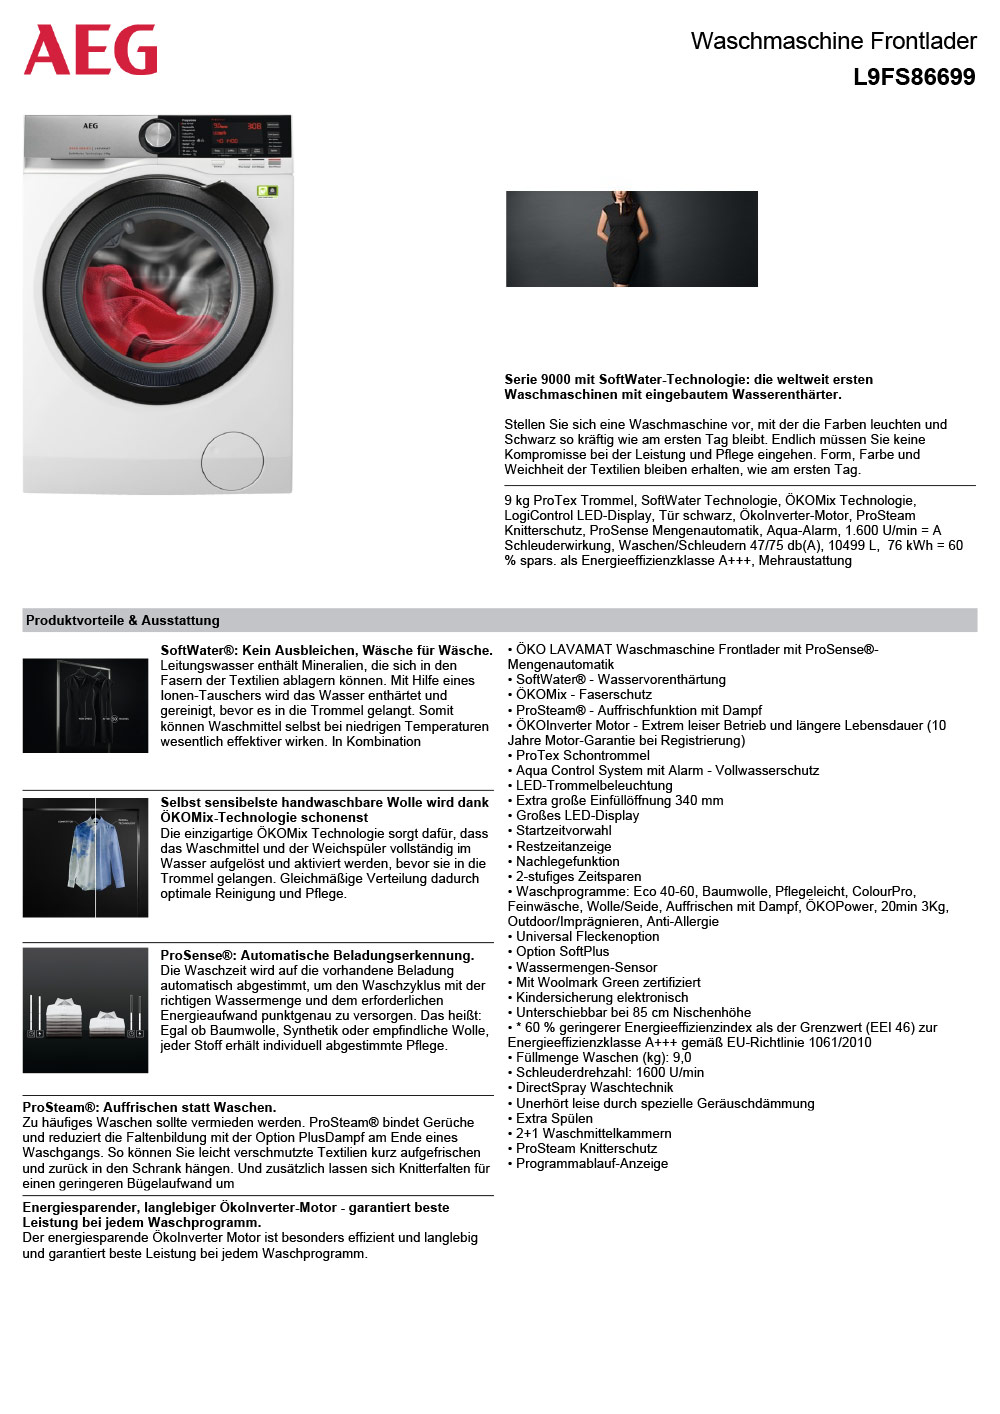 Datasheet AEG L9FS86699 Waschmaschine